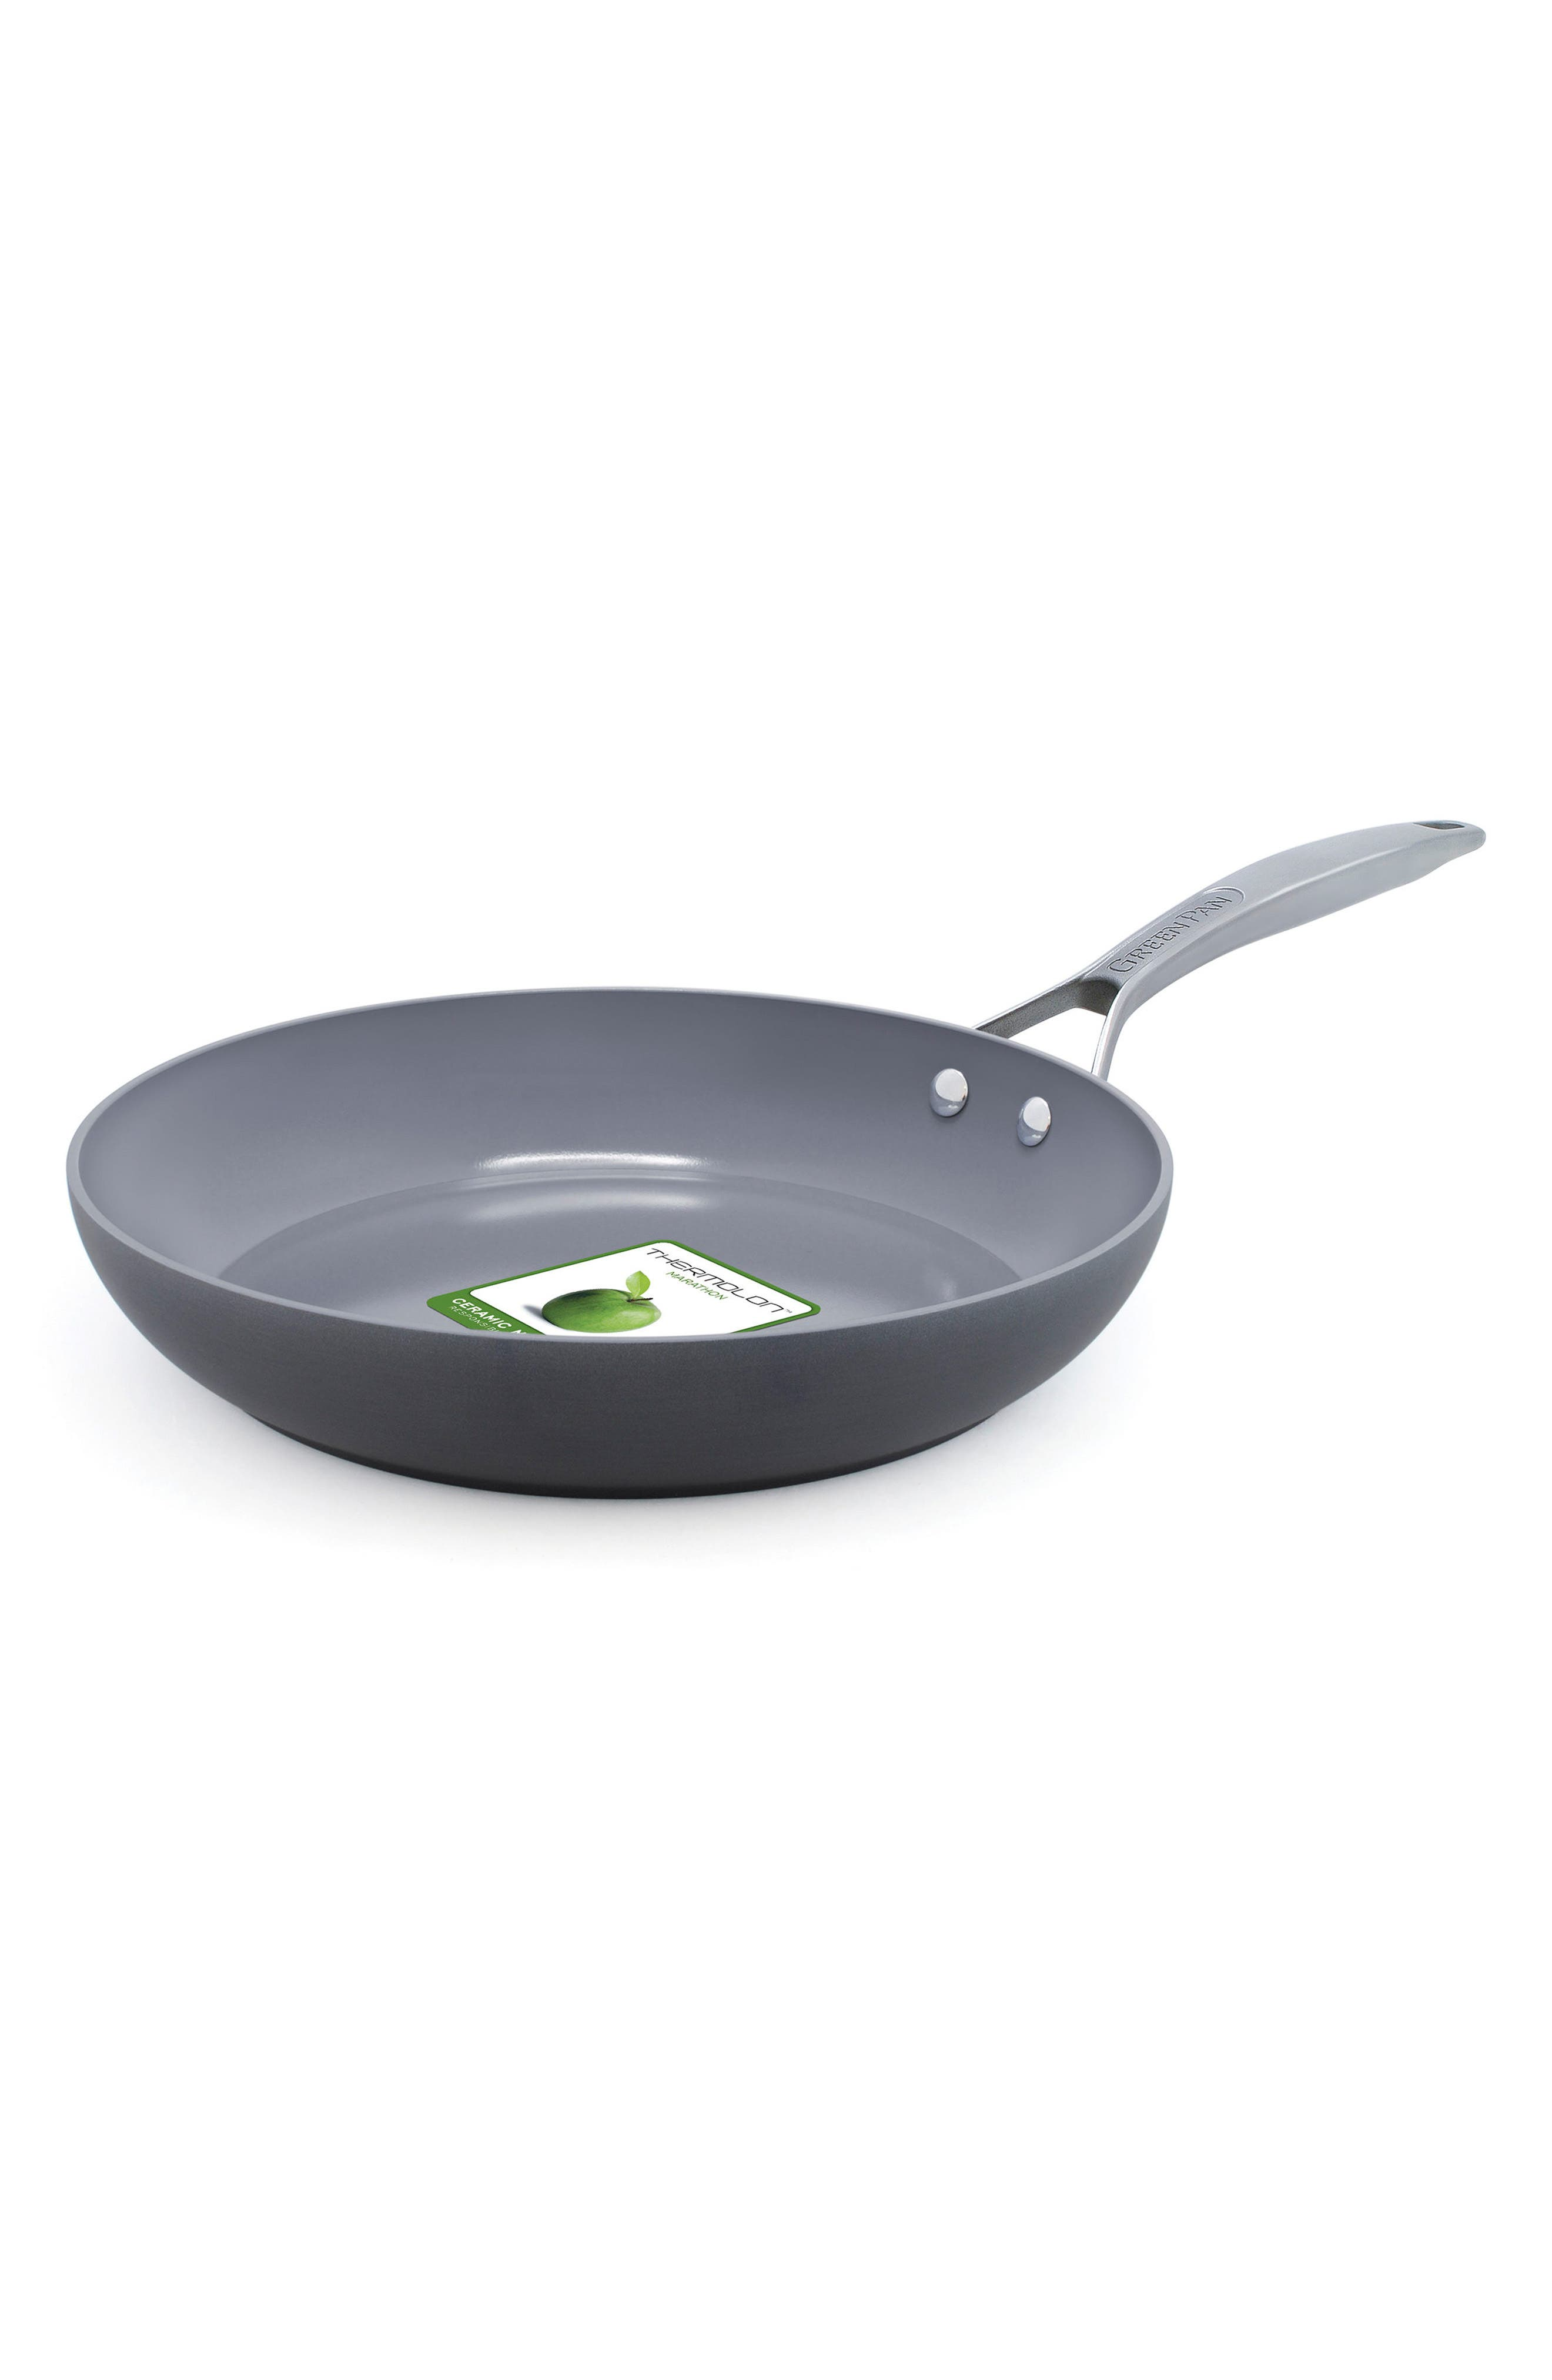 Paris 10-Inch Anodized Aluminum Ceramic Nonstick Frying Pan,                         Main,                         color, GREY